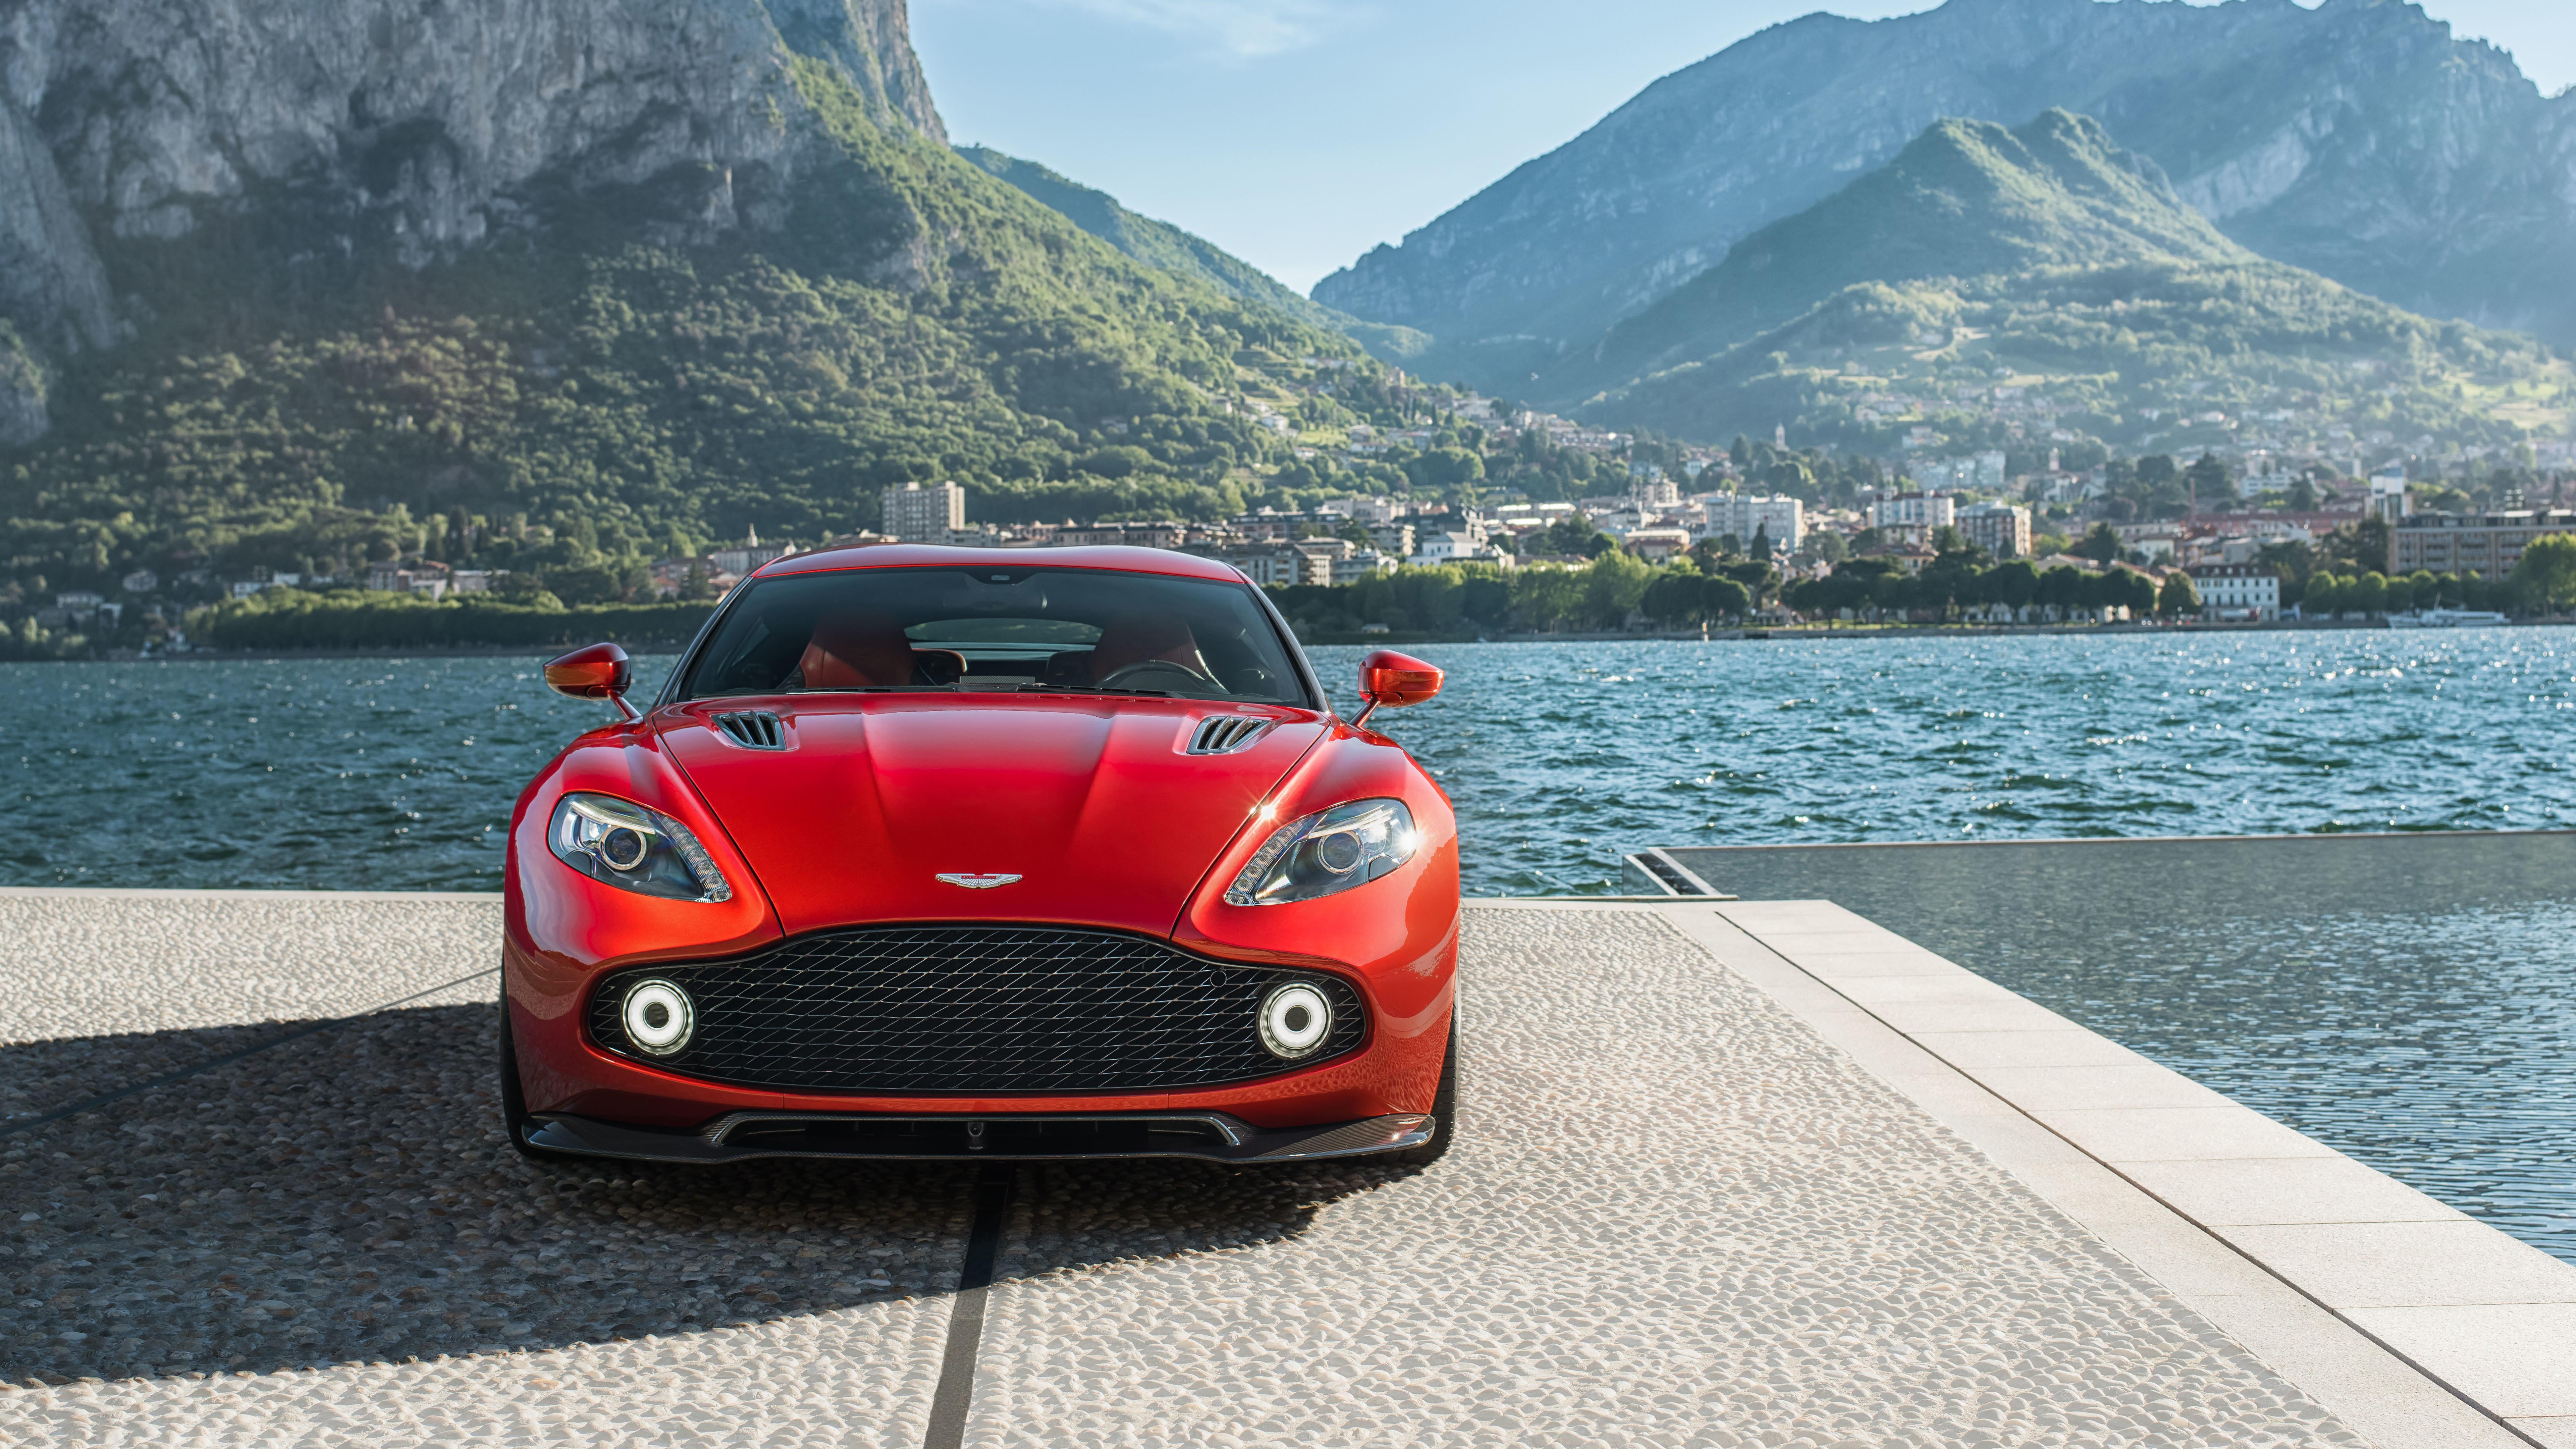 Wallpaper 4k Aston Martin Zagato 4k 8k Aston Martin Realm